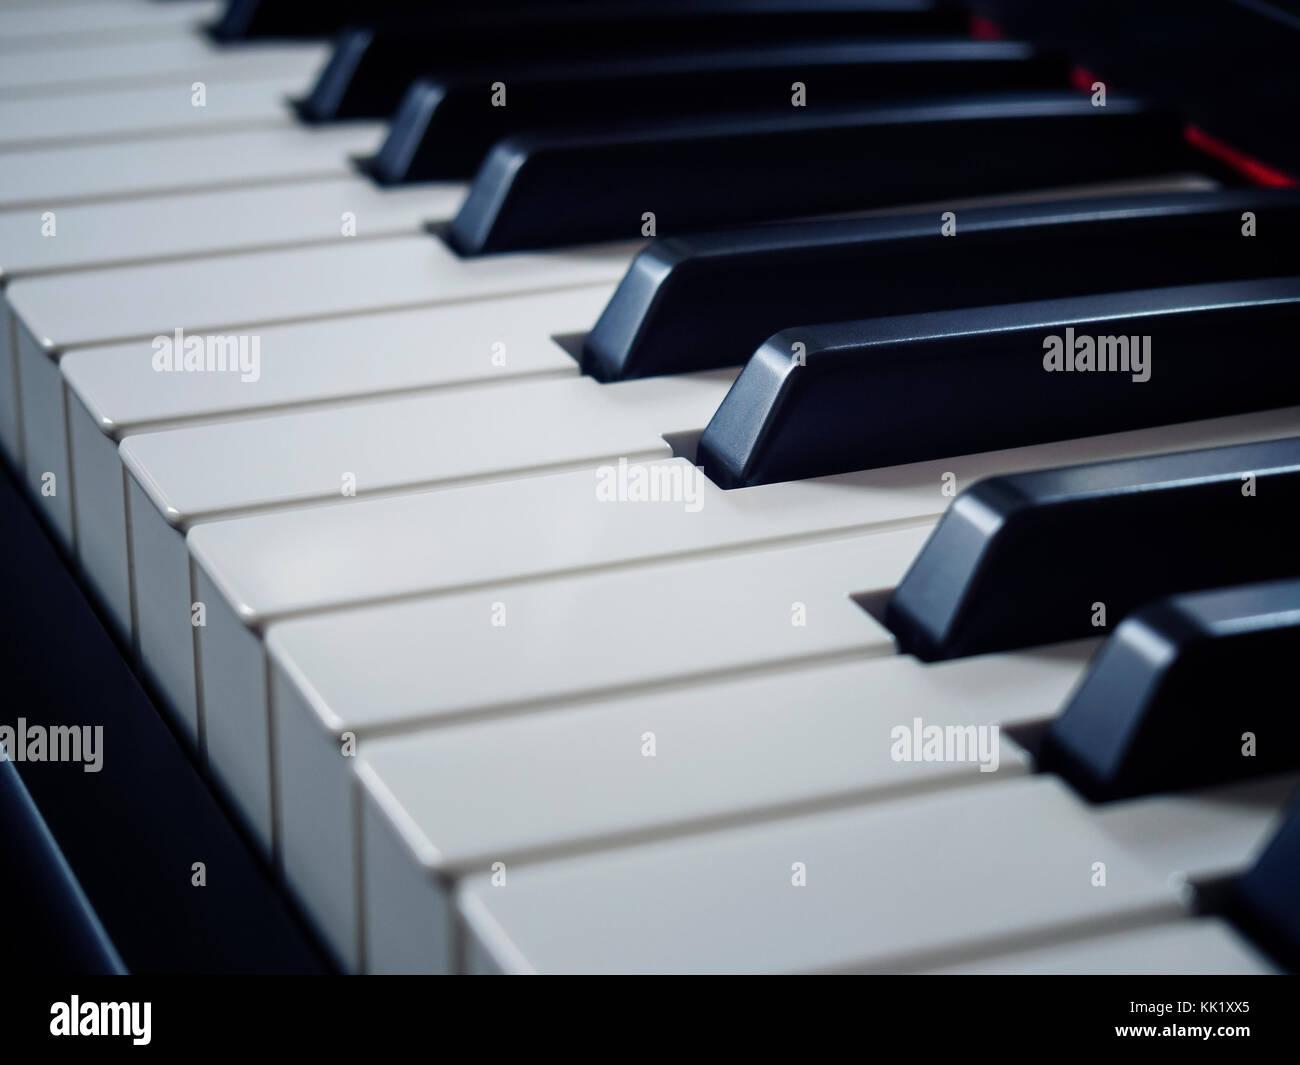 Piano keys close-up - Stock Image